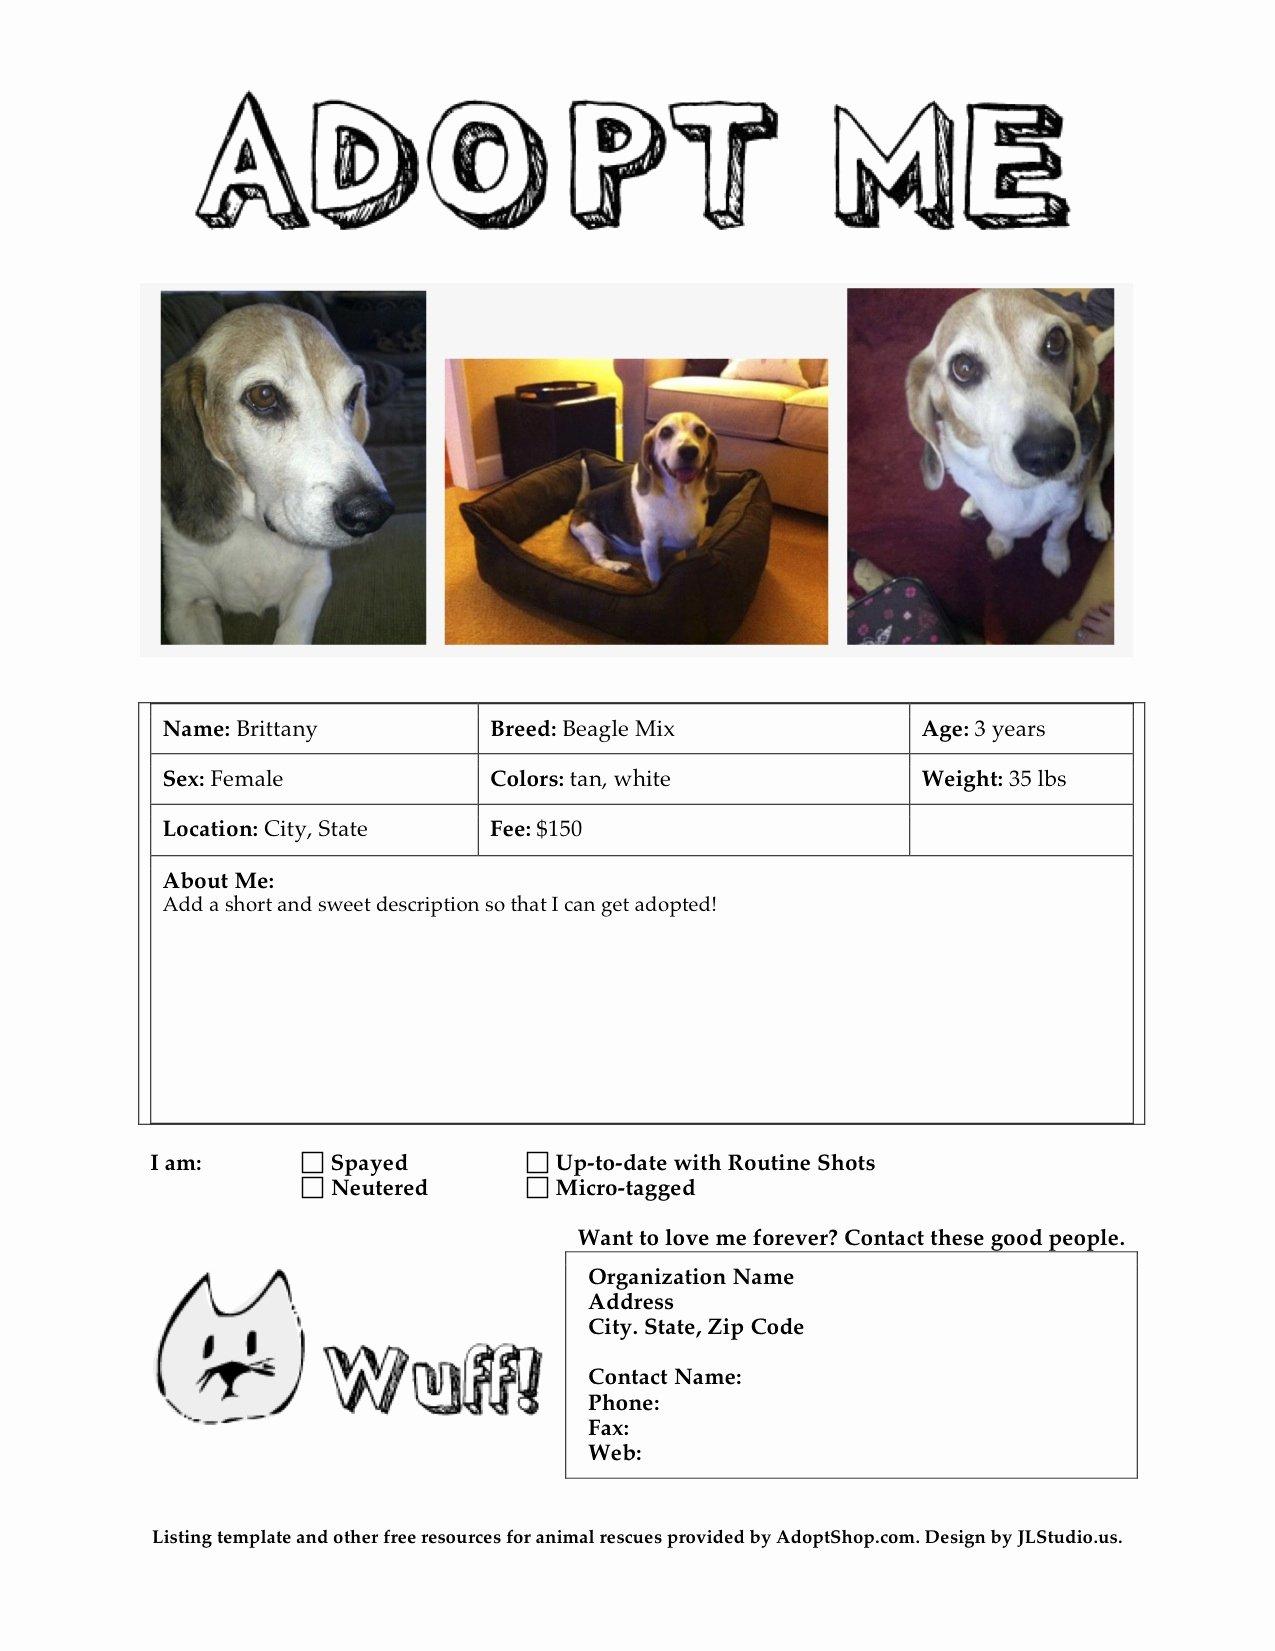 Pet Adoption Flyer Template Inspirational Meow Wuff Adoption Flyer Templates